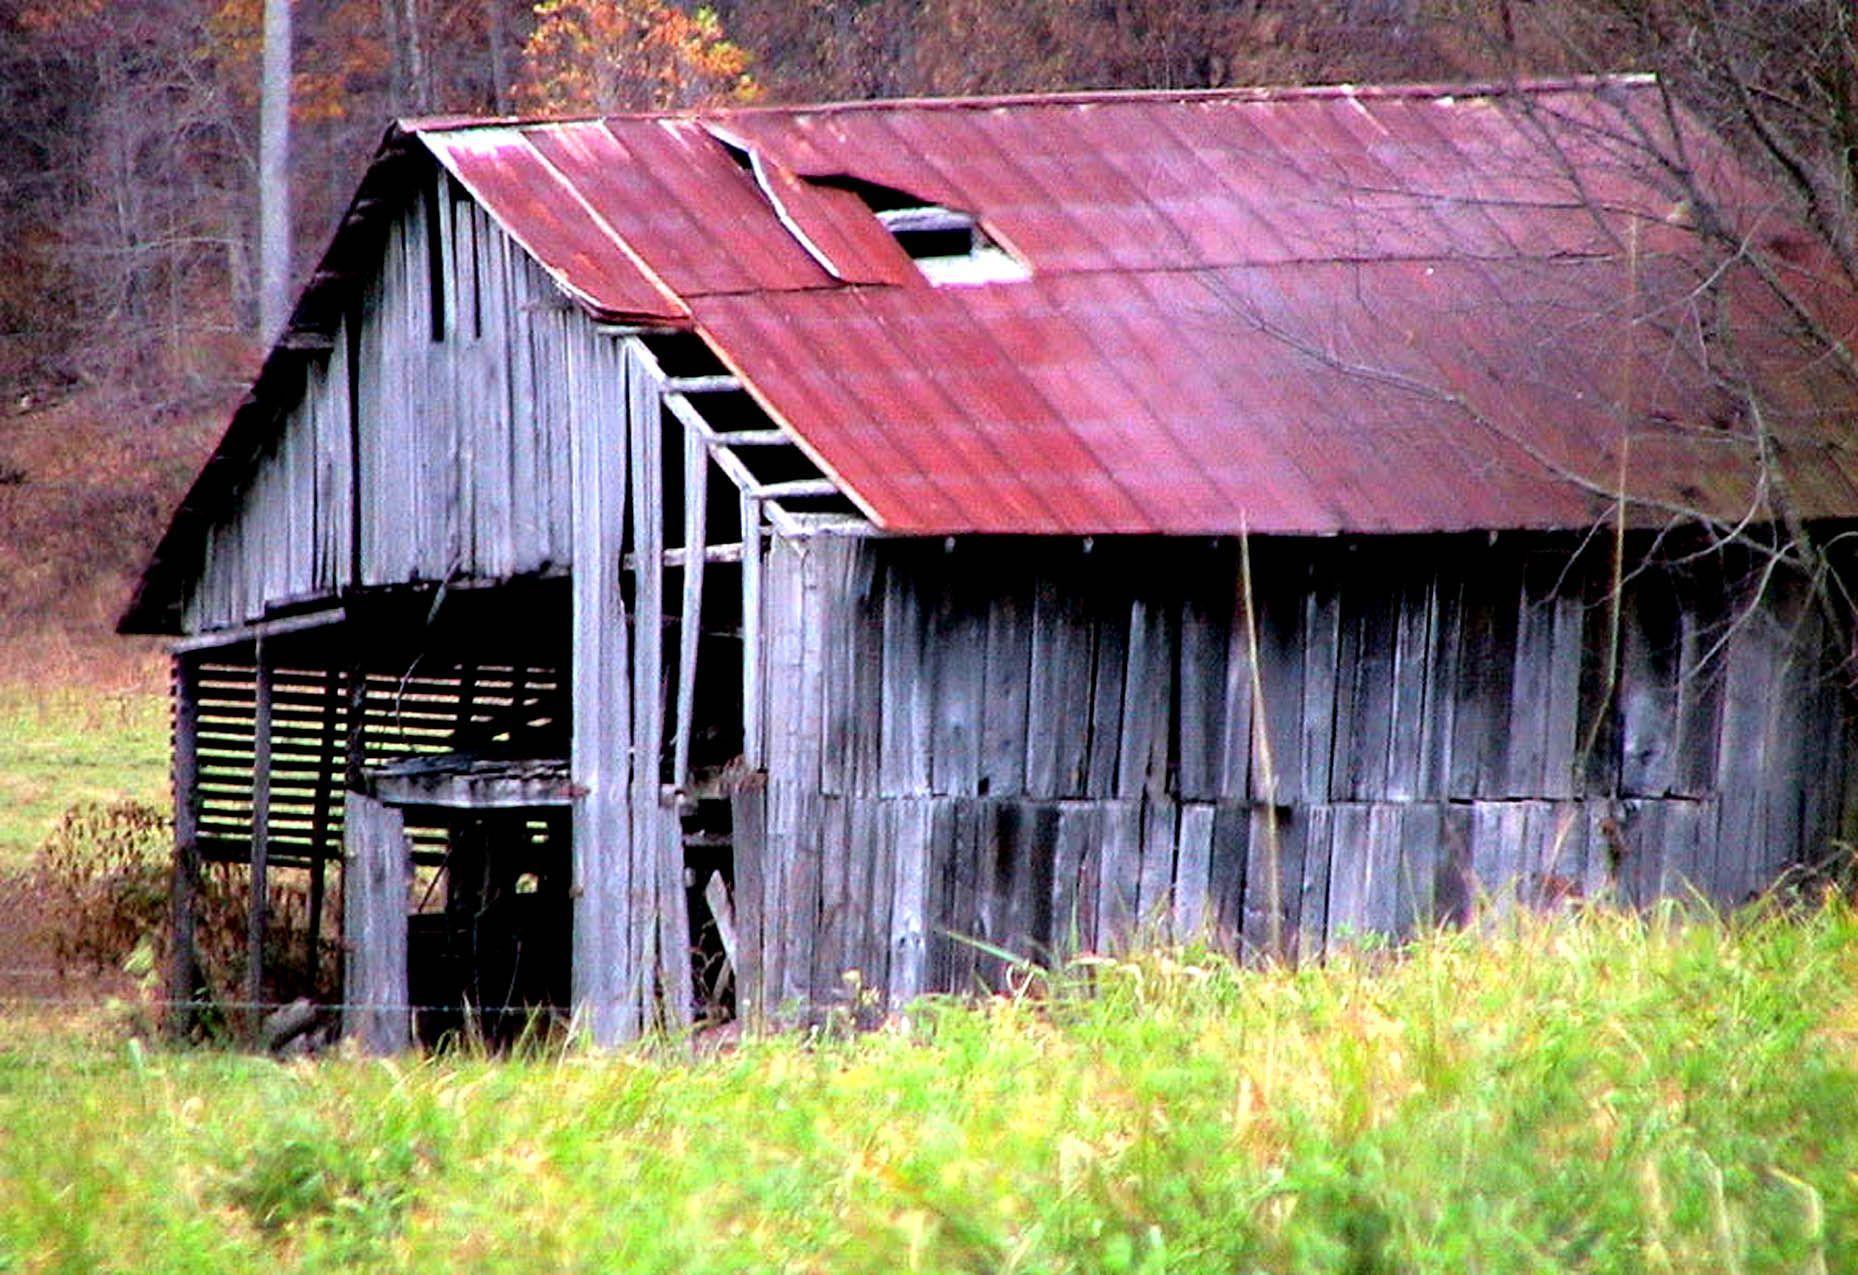 Abandoned_horse_barn_in_autumn_fall